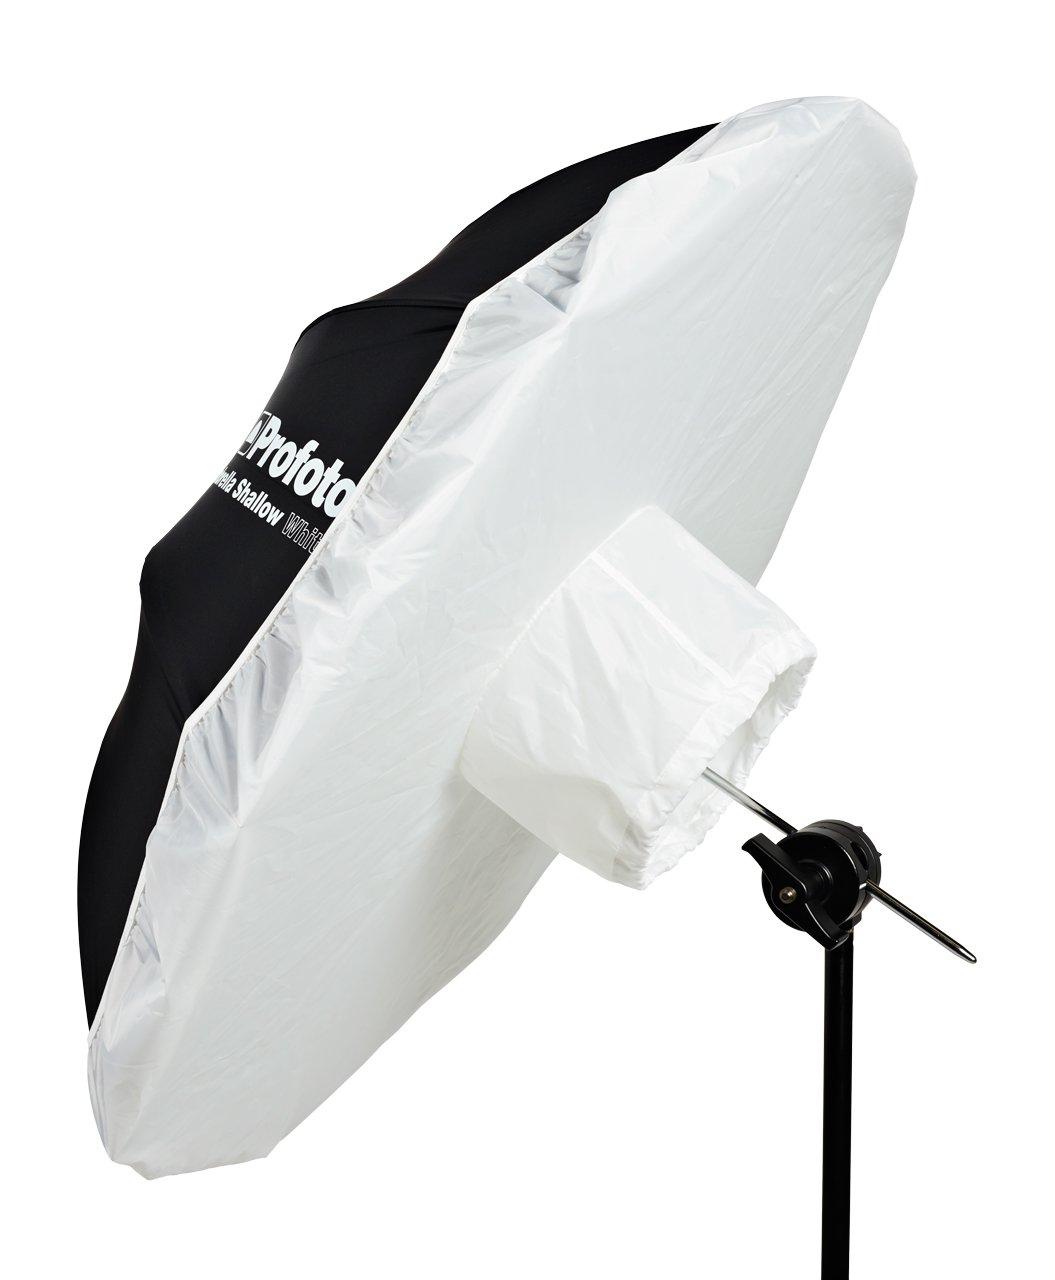 Profoto Umbrella Diffuser (Medium) by Profoto (Image #1)